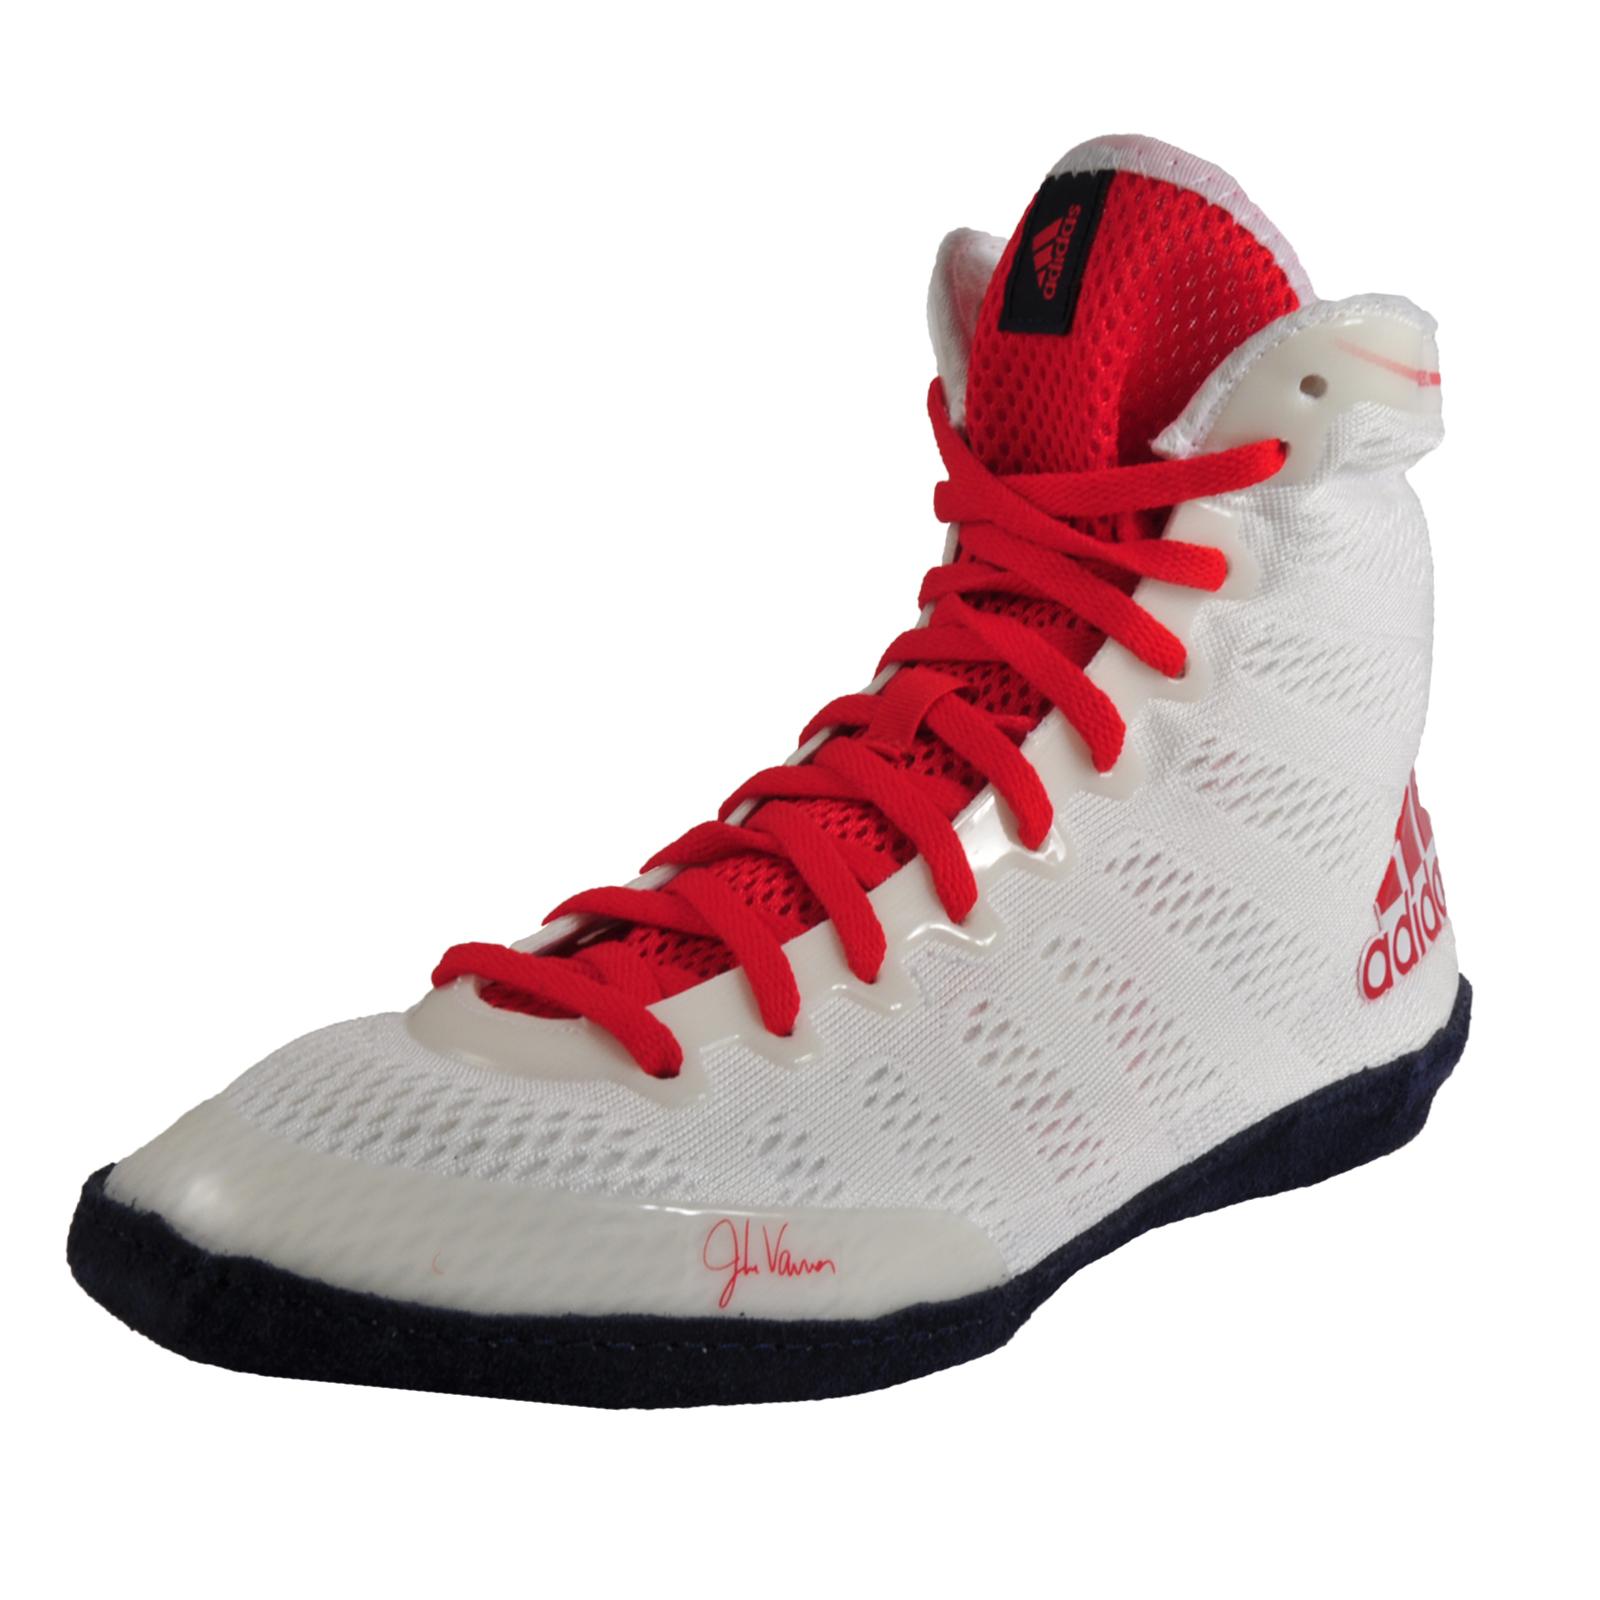 new product 705b4 c7bbc Adidas Adizero XIV Mens Jake Varner Signature Wrestling Boots Shoes White